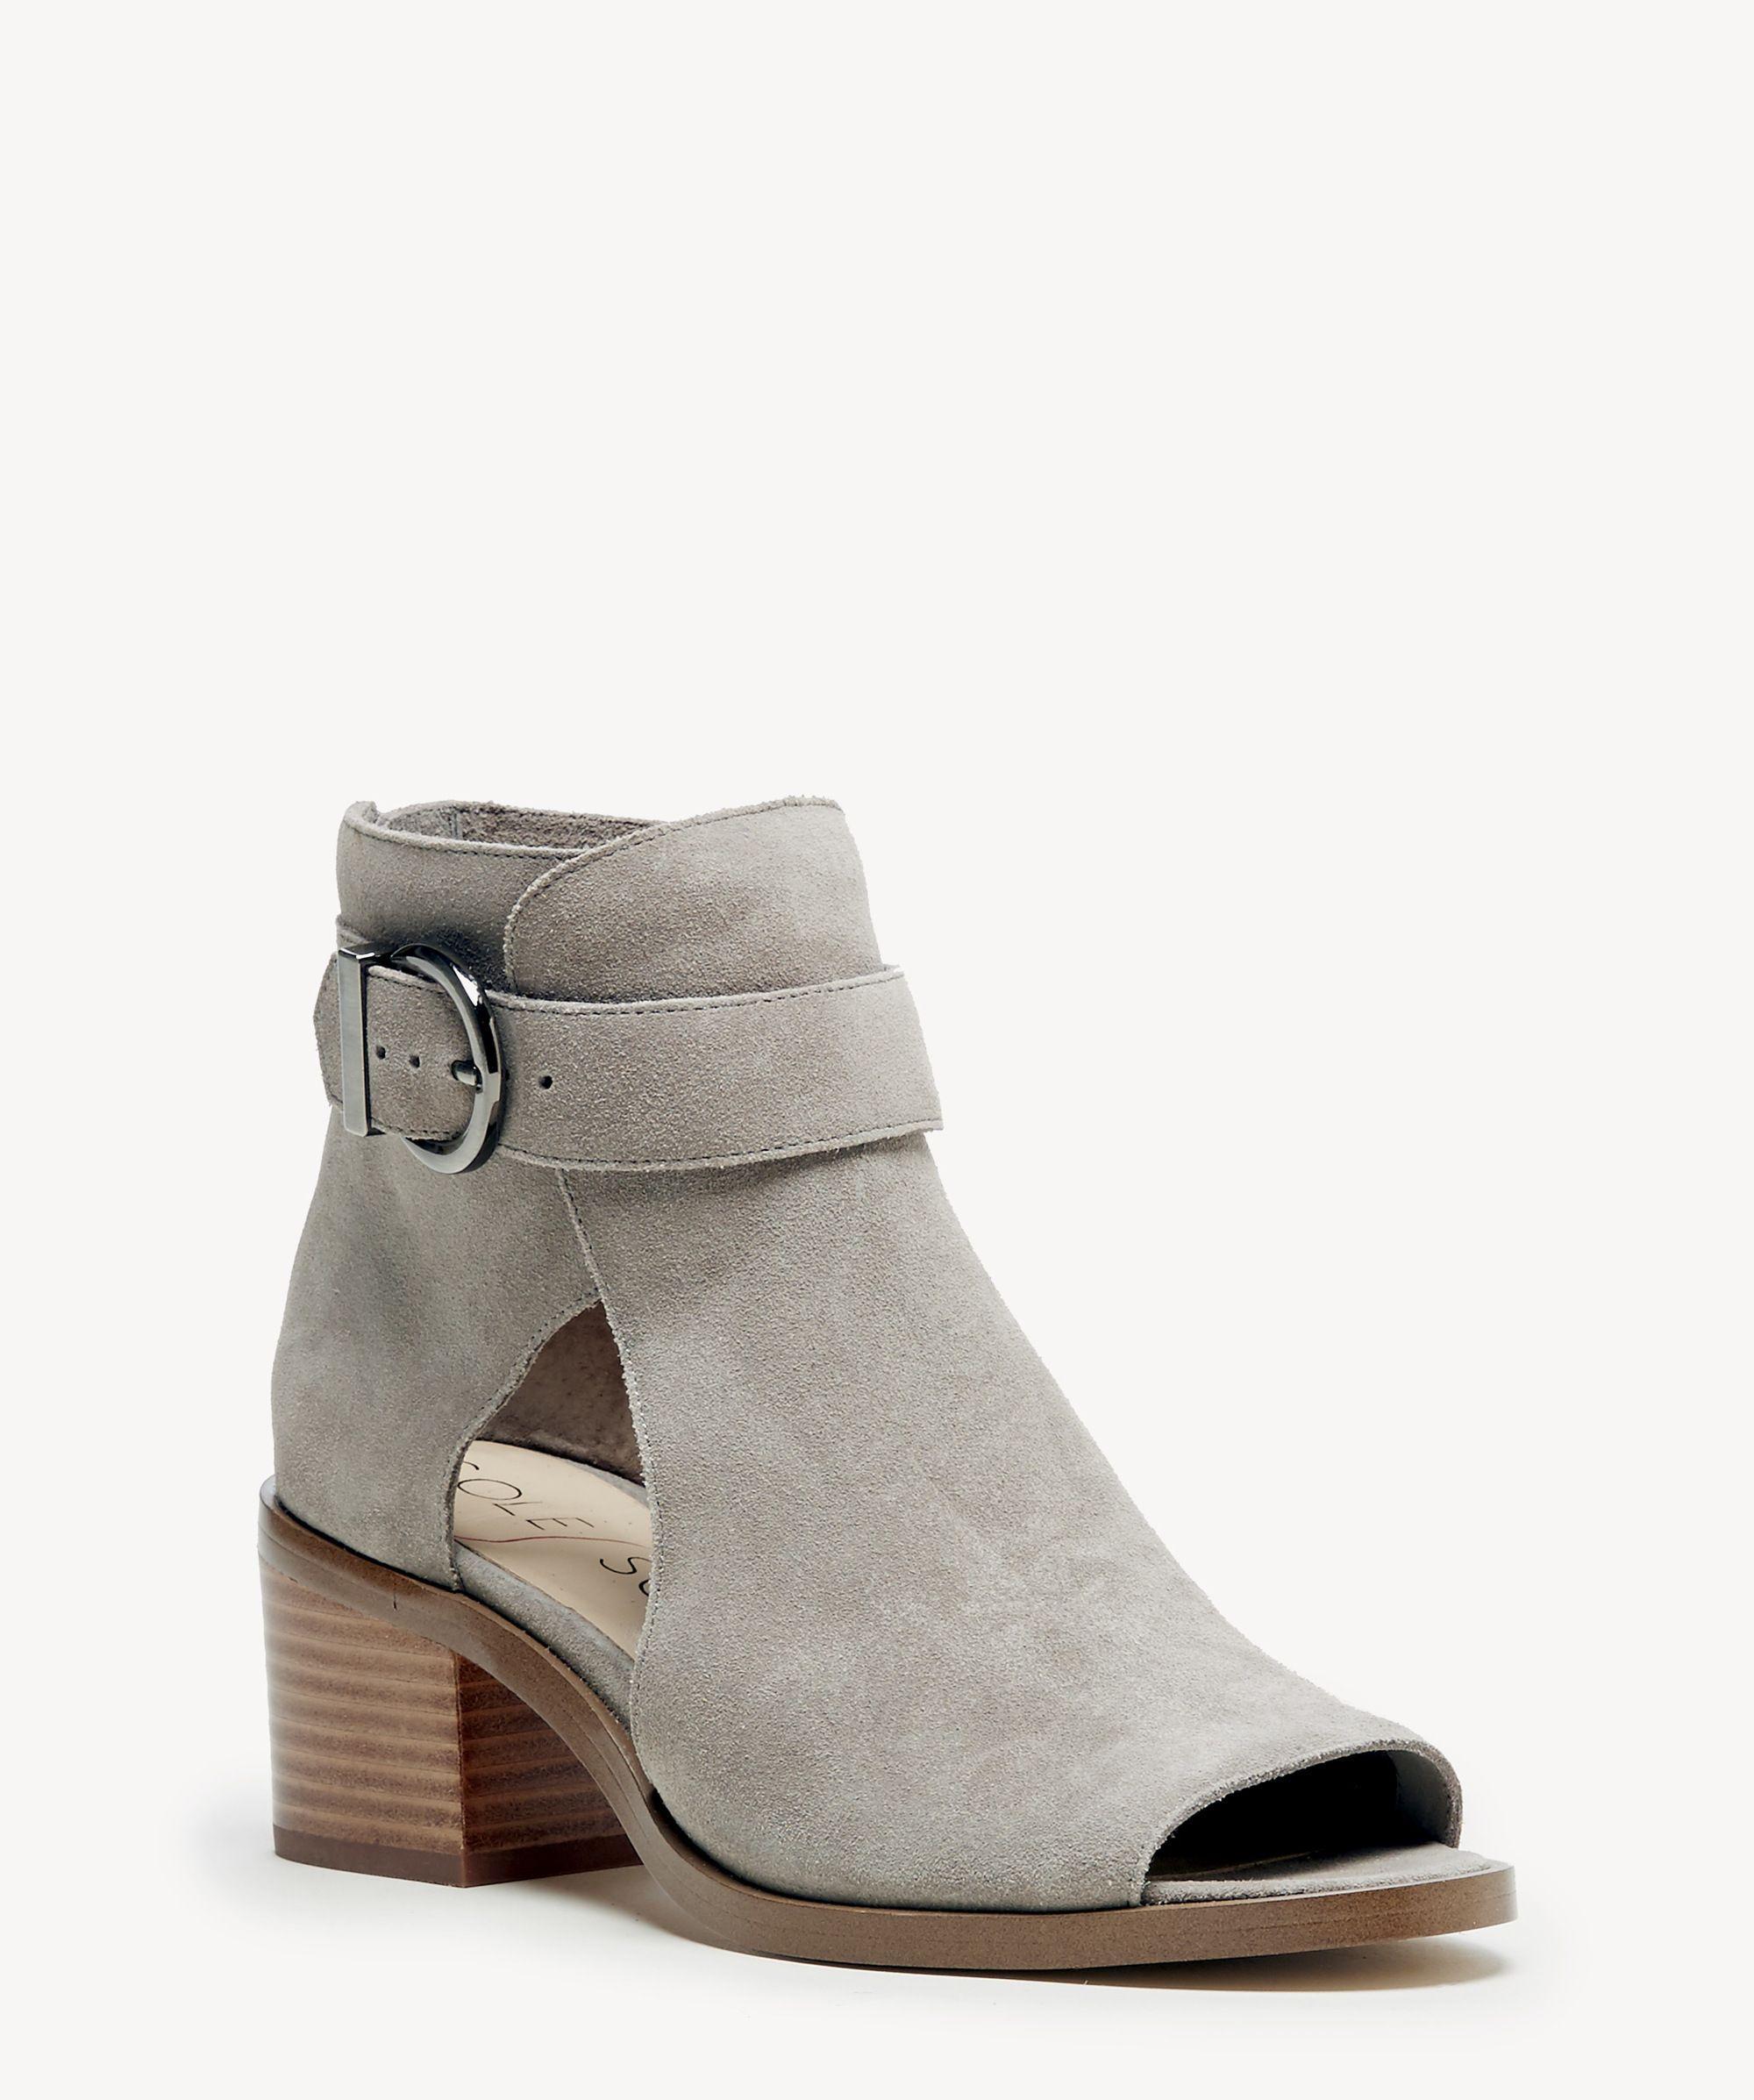 5e18586c4f72 Lyst - Sole Society Tracy Block Heel Sandal